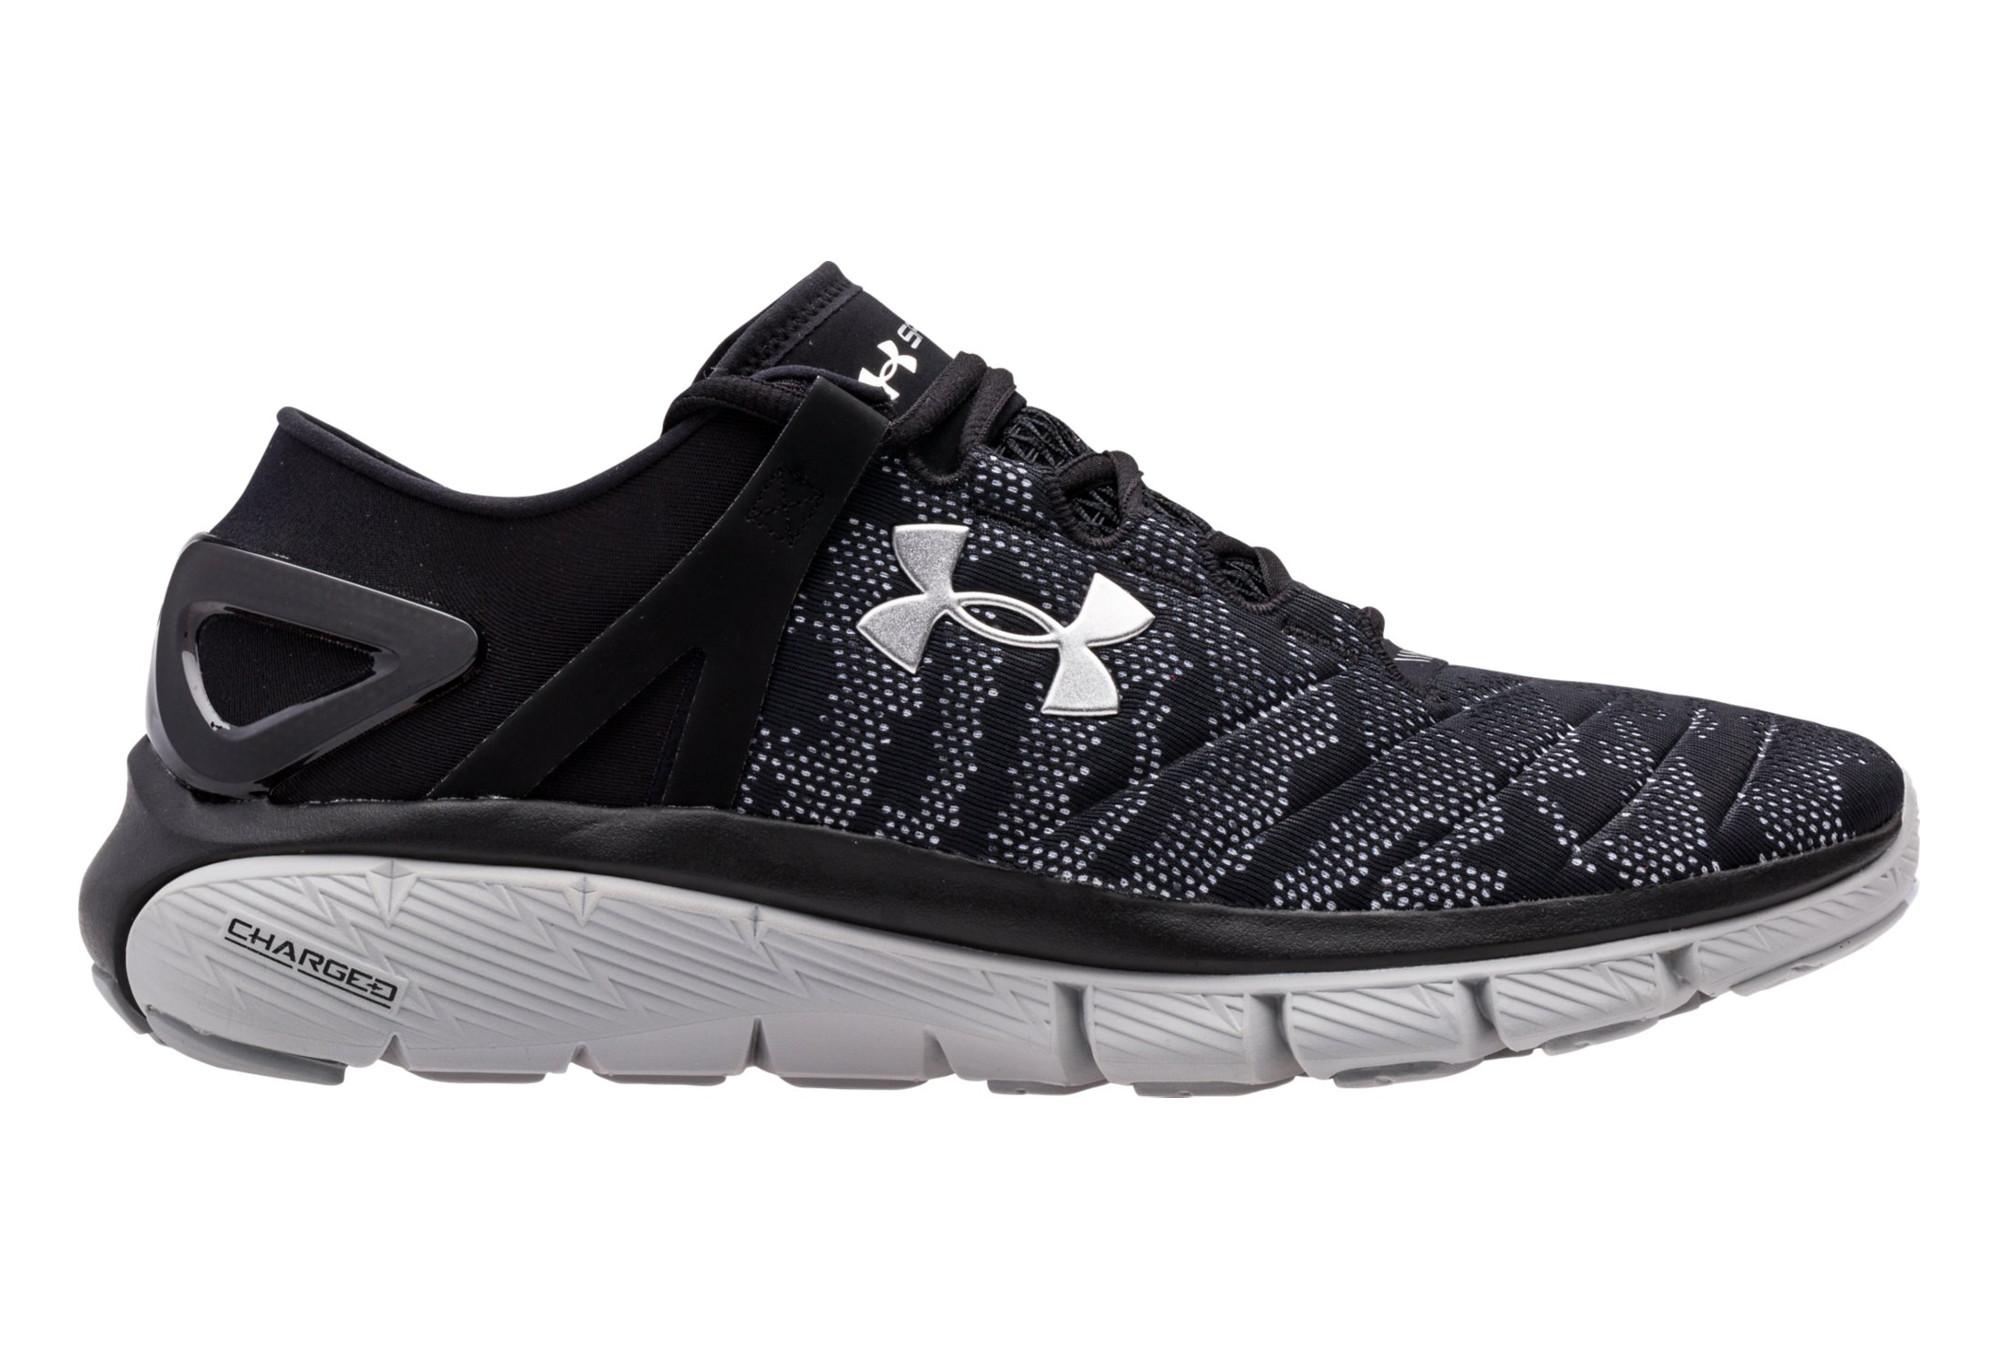 under armour speedform fortis vent pair of shoes black. Black Bedroom Furniture Sets. Home Design Ideas